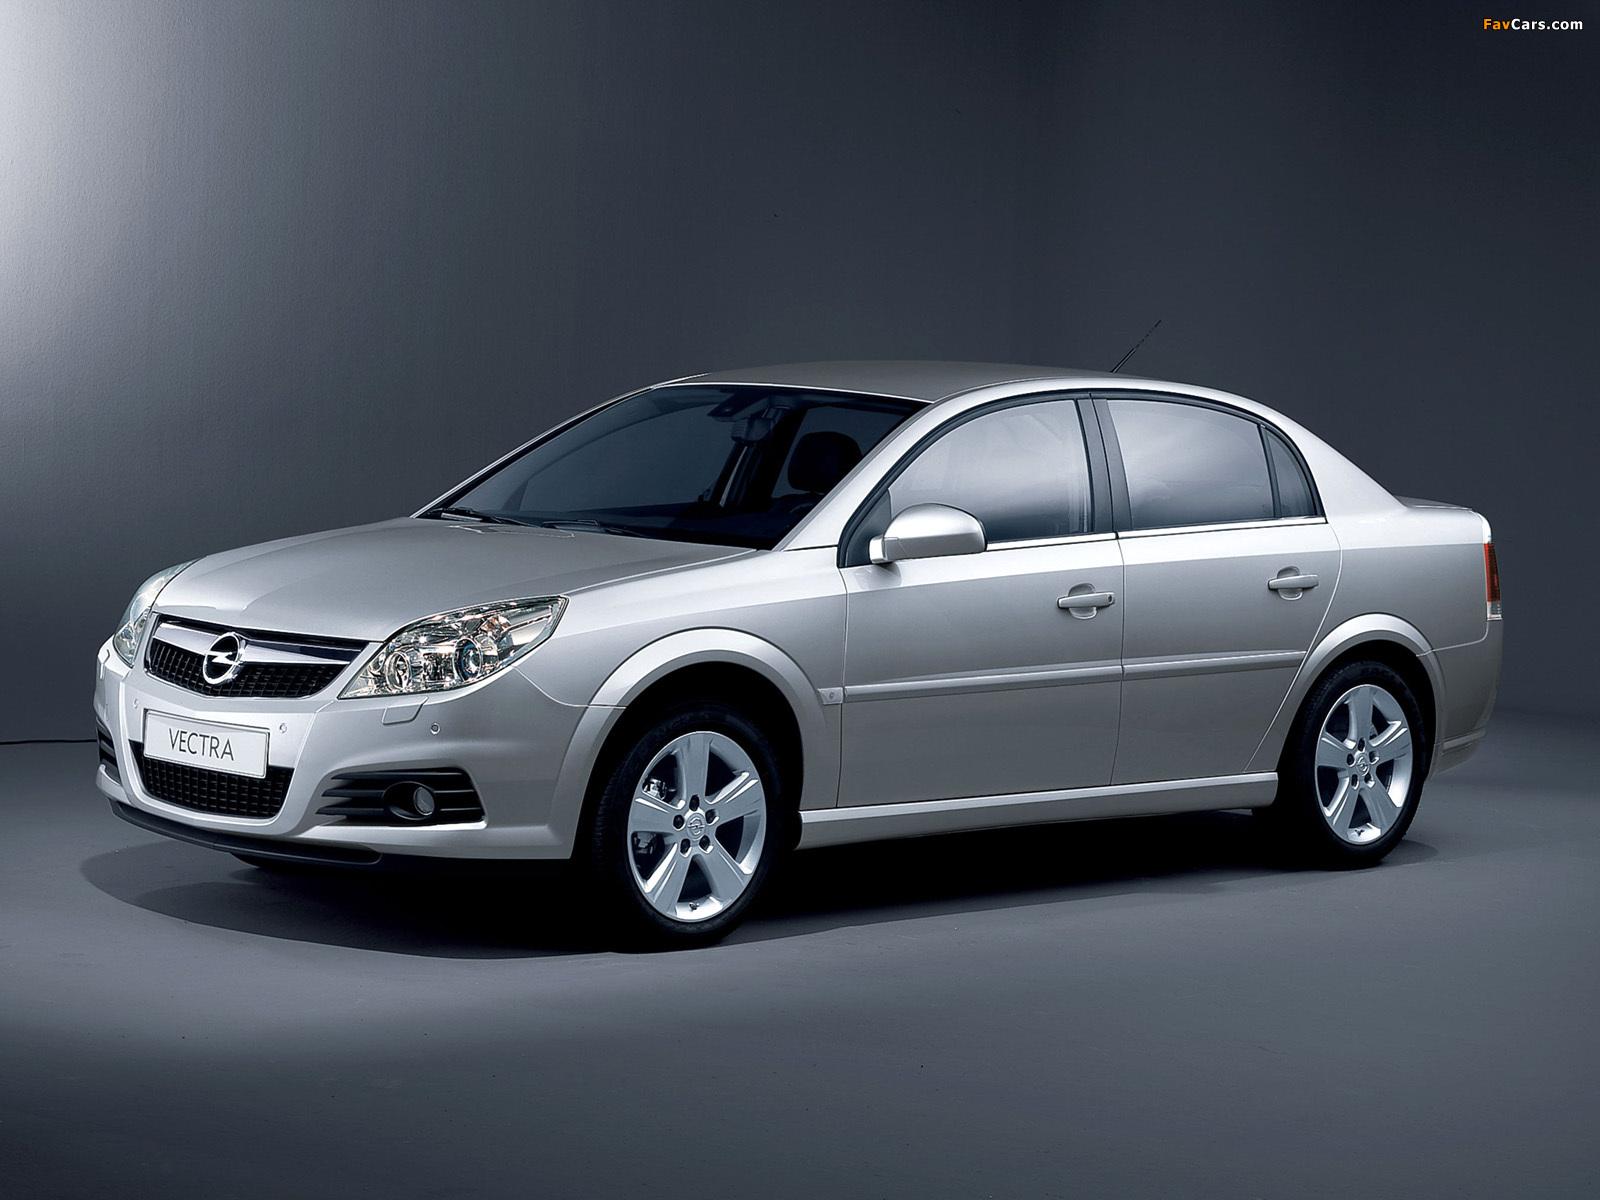 Images of Opel Vectra Sedan C 200508 1600x1200 1600x1200